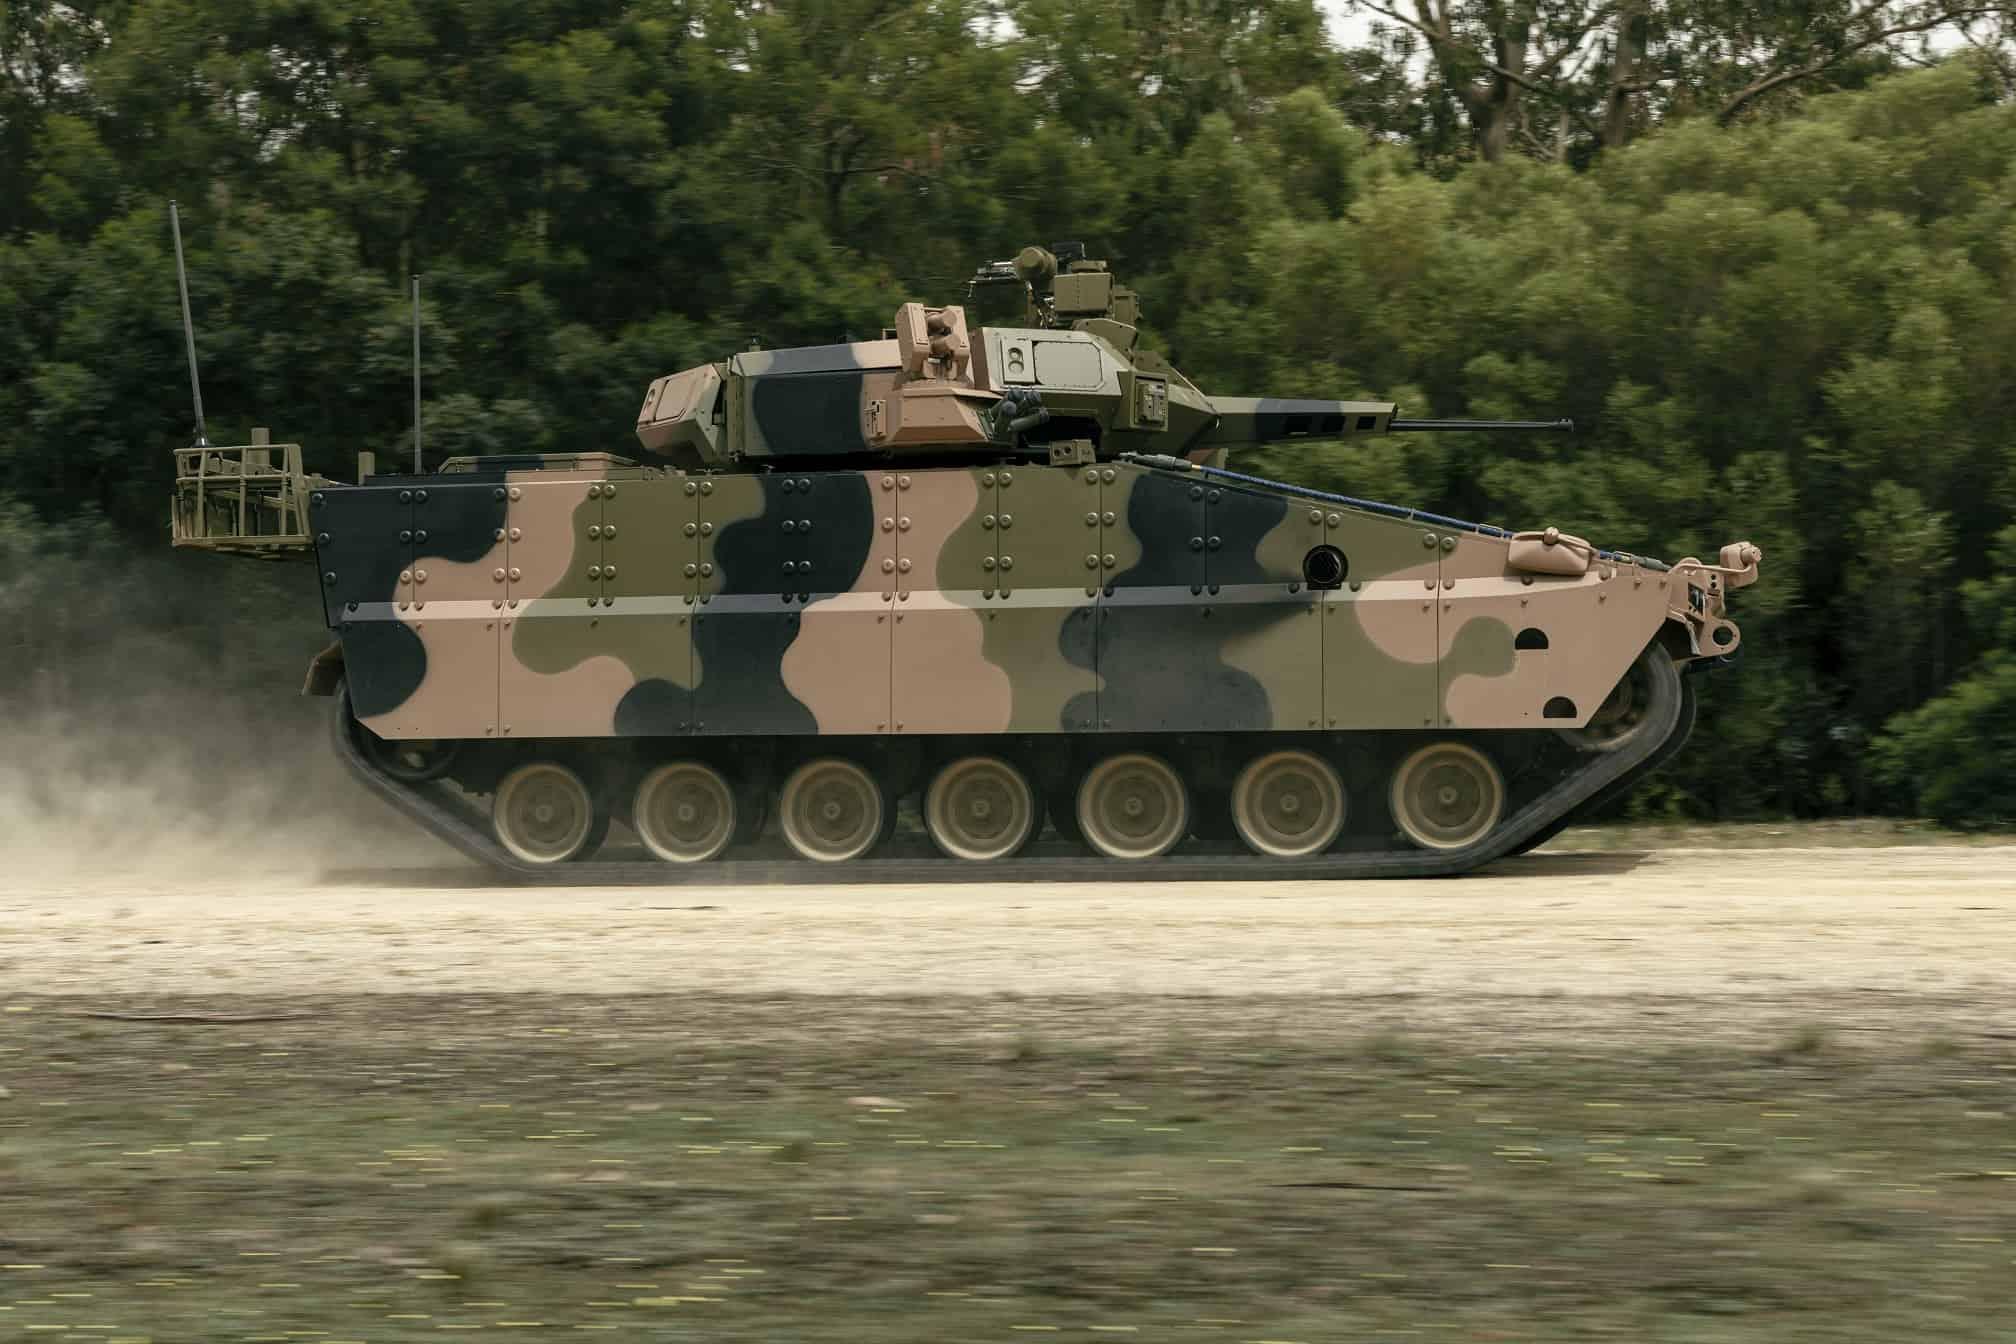 Бойова машина піхота Redback IFV від Hanwha Defense